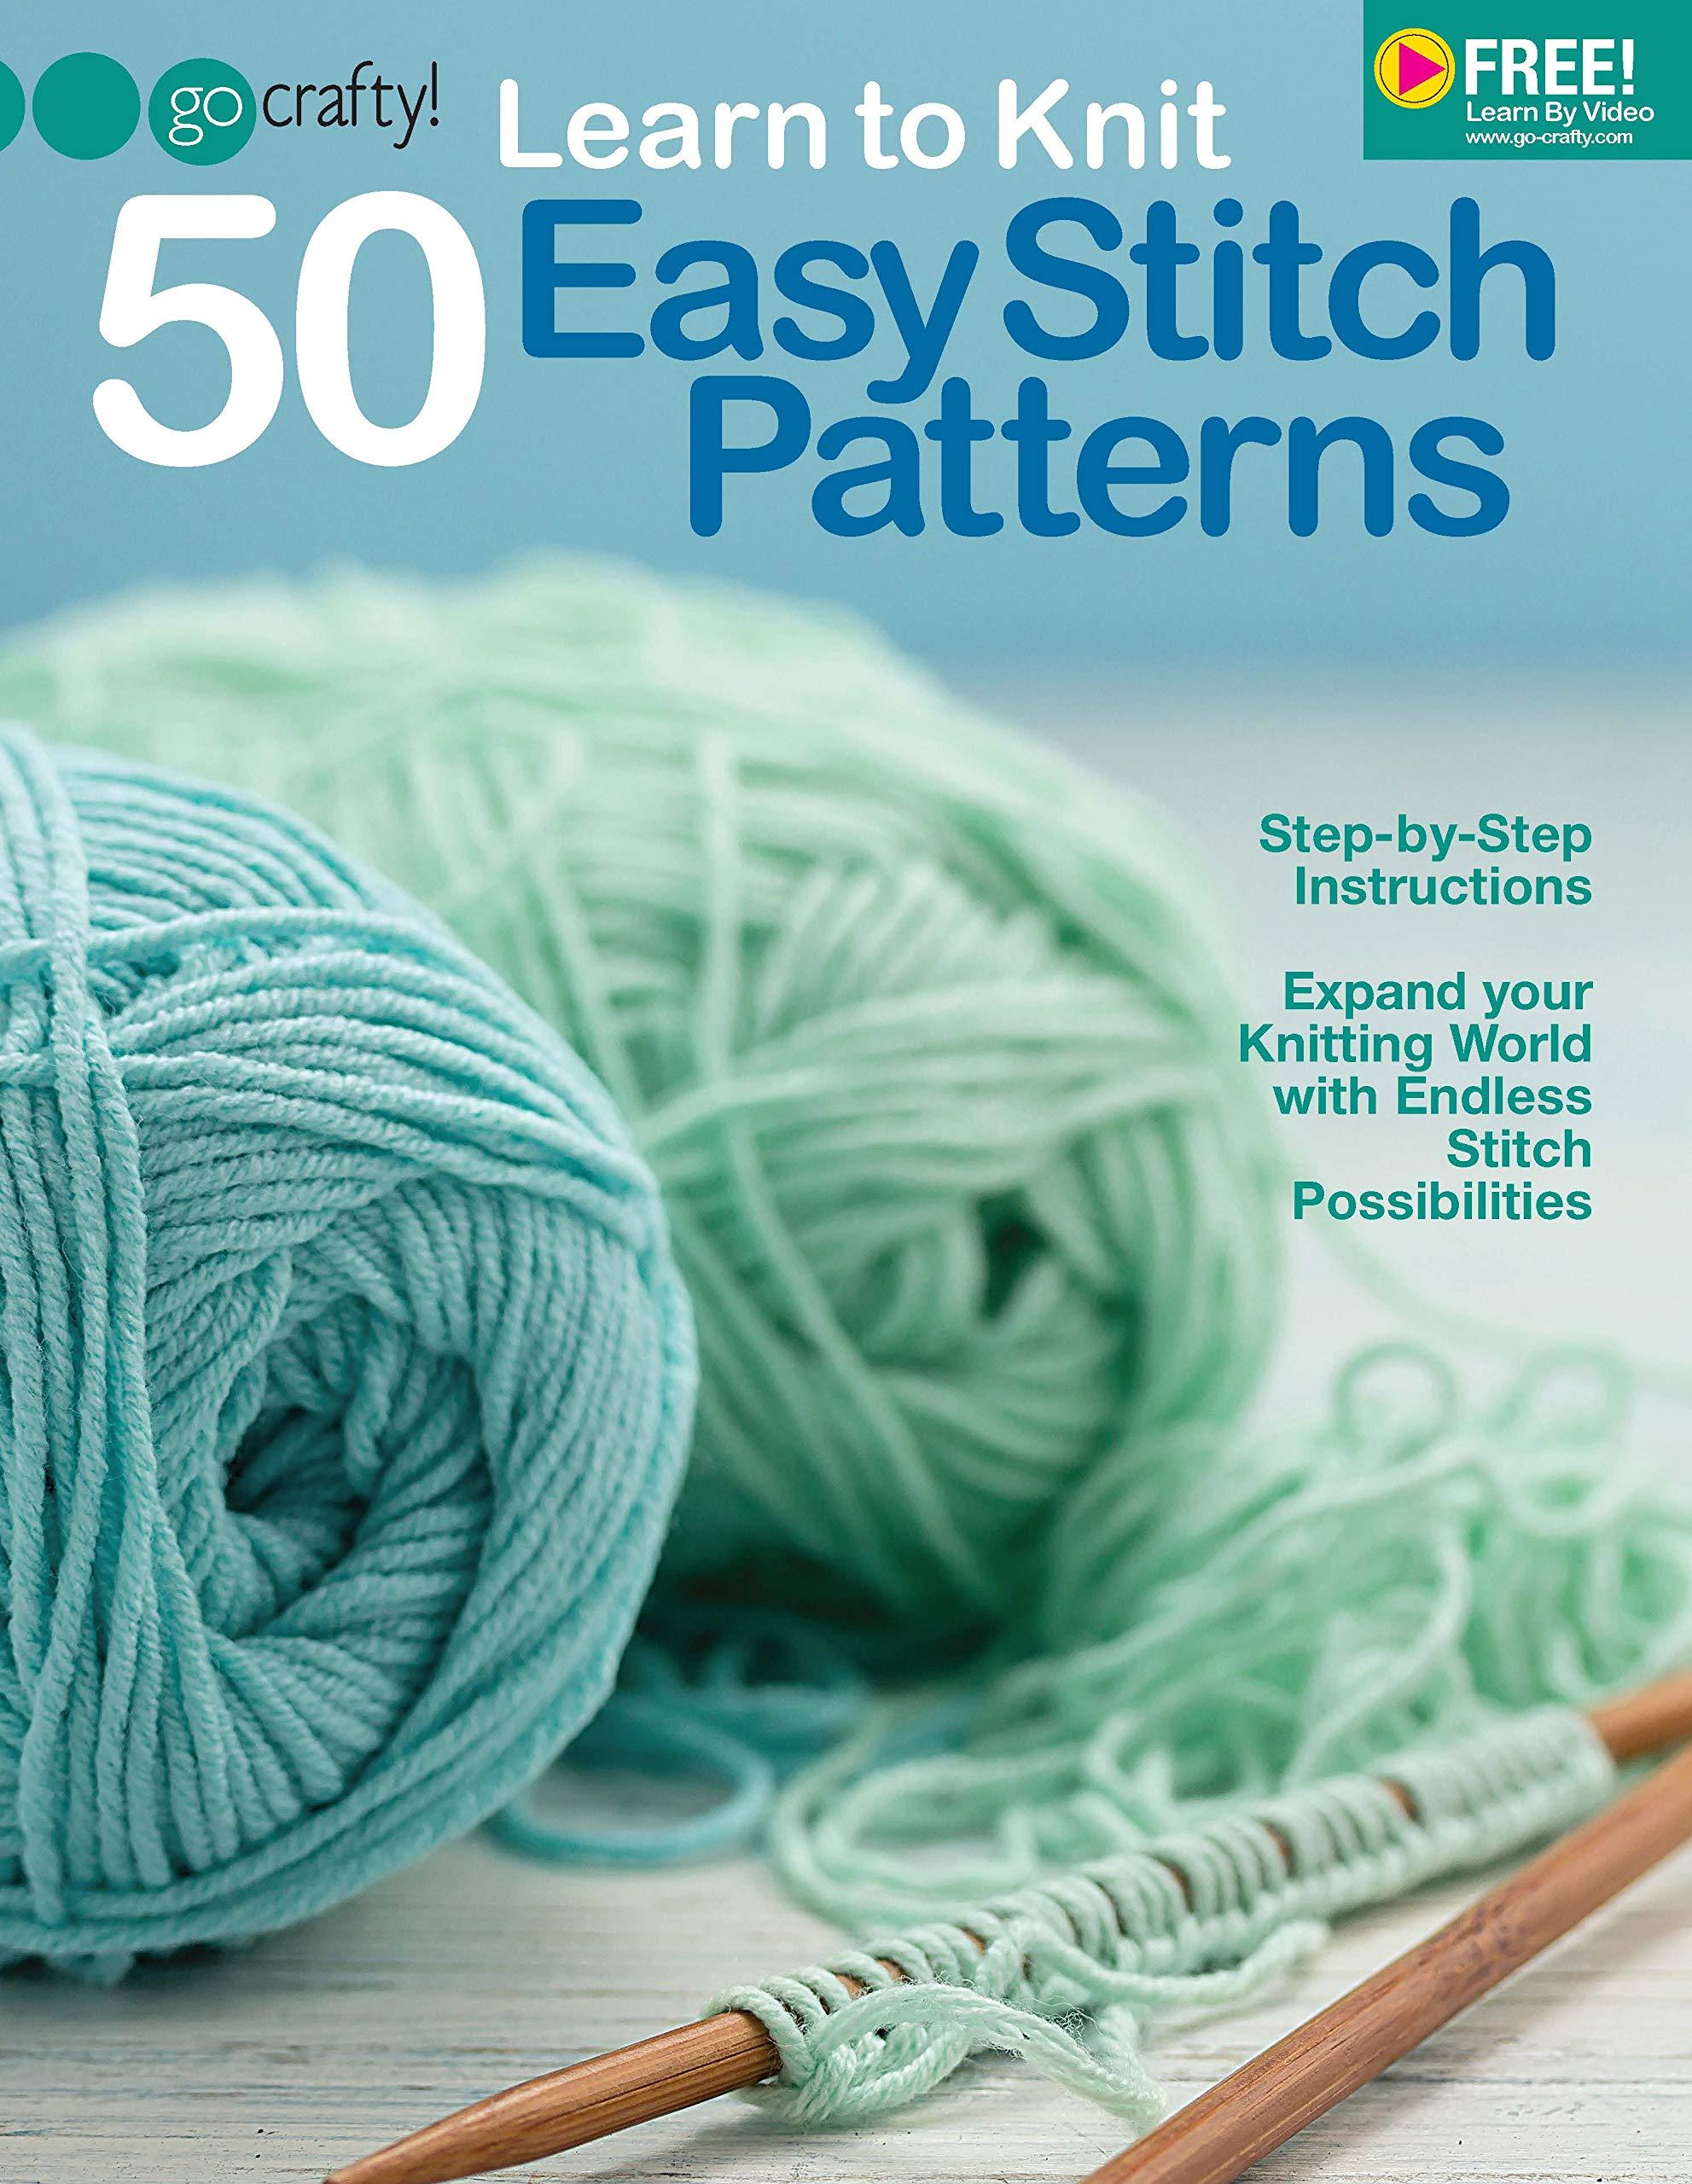 61da61179a3c Learn to Knit 50 Easy Stitch Patterns  The Editors of Go-Crafty ...